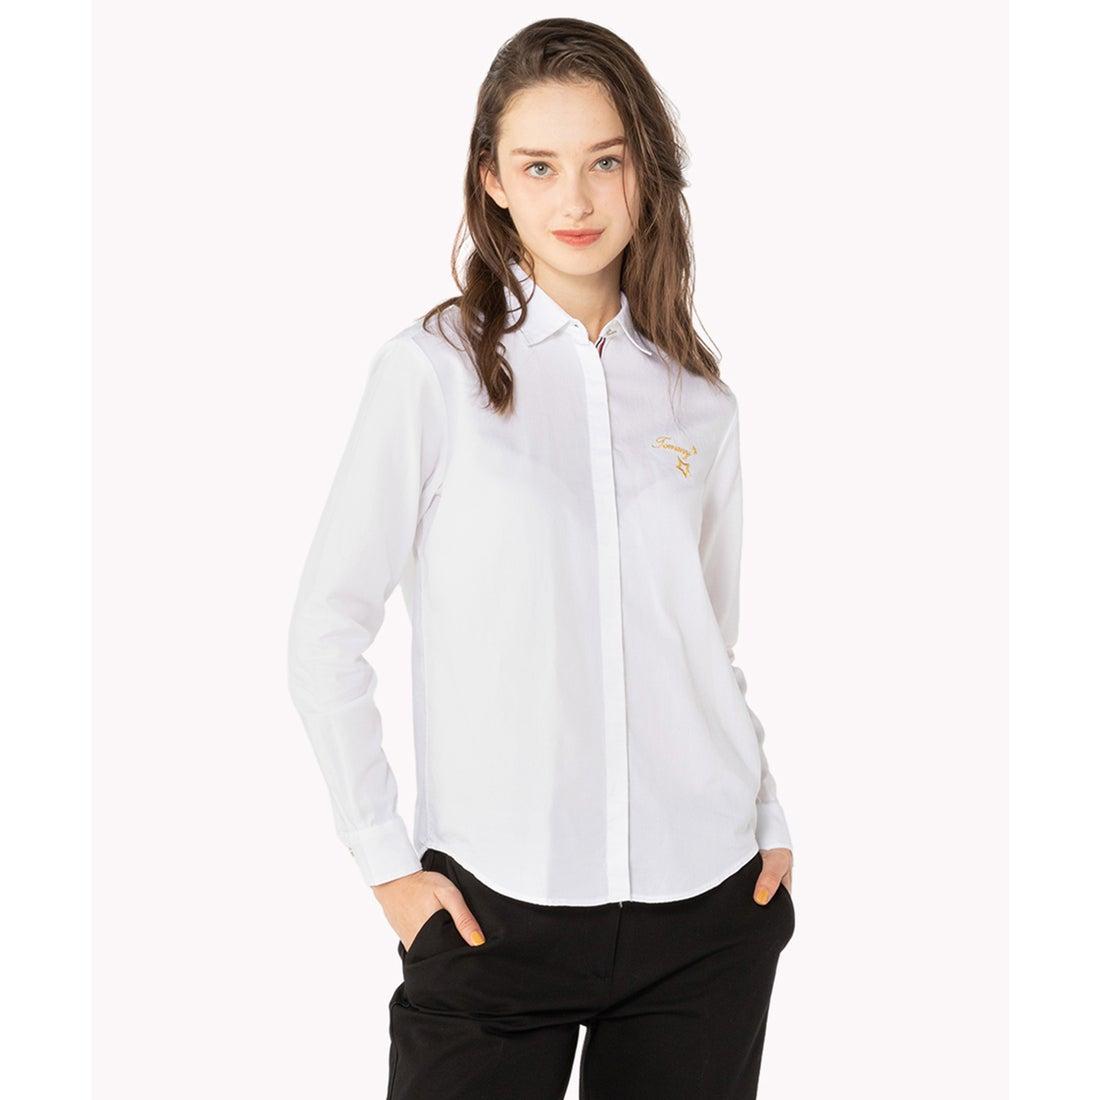 100 packs x 40 White Shirt Blouse Buttons 4000 buttons